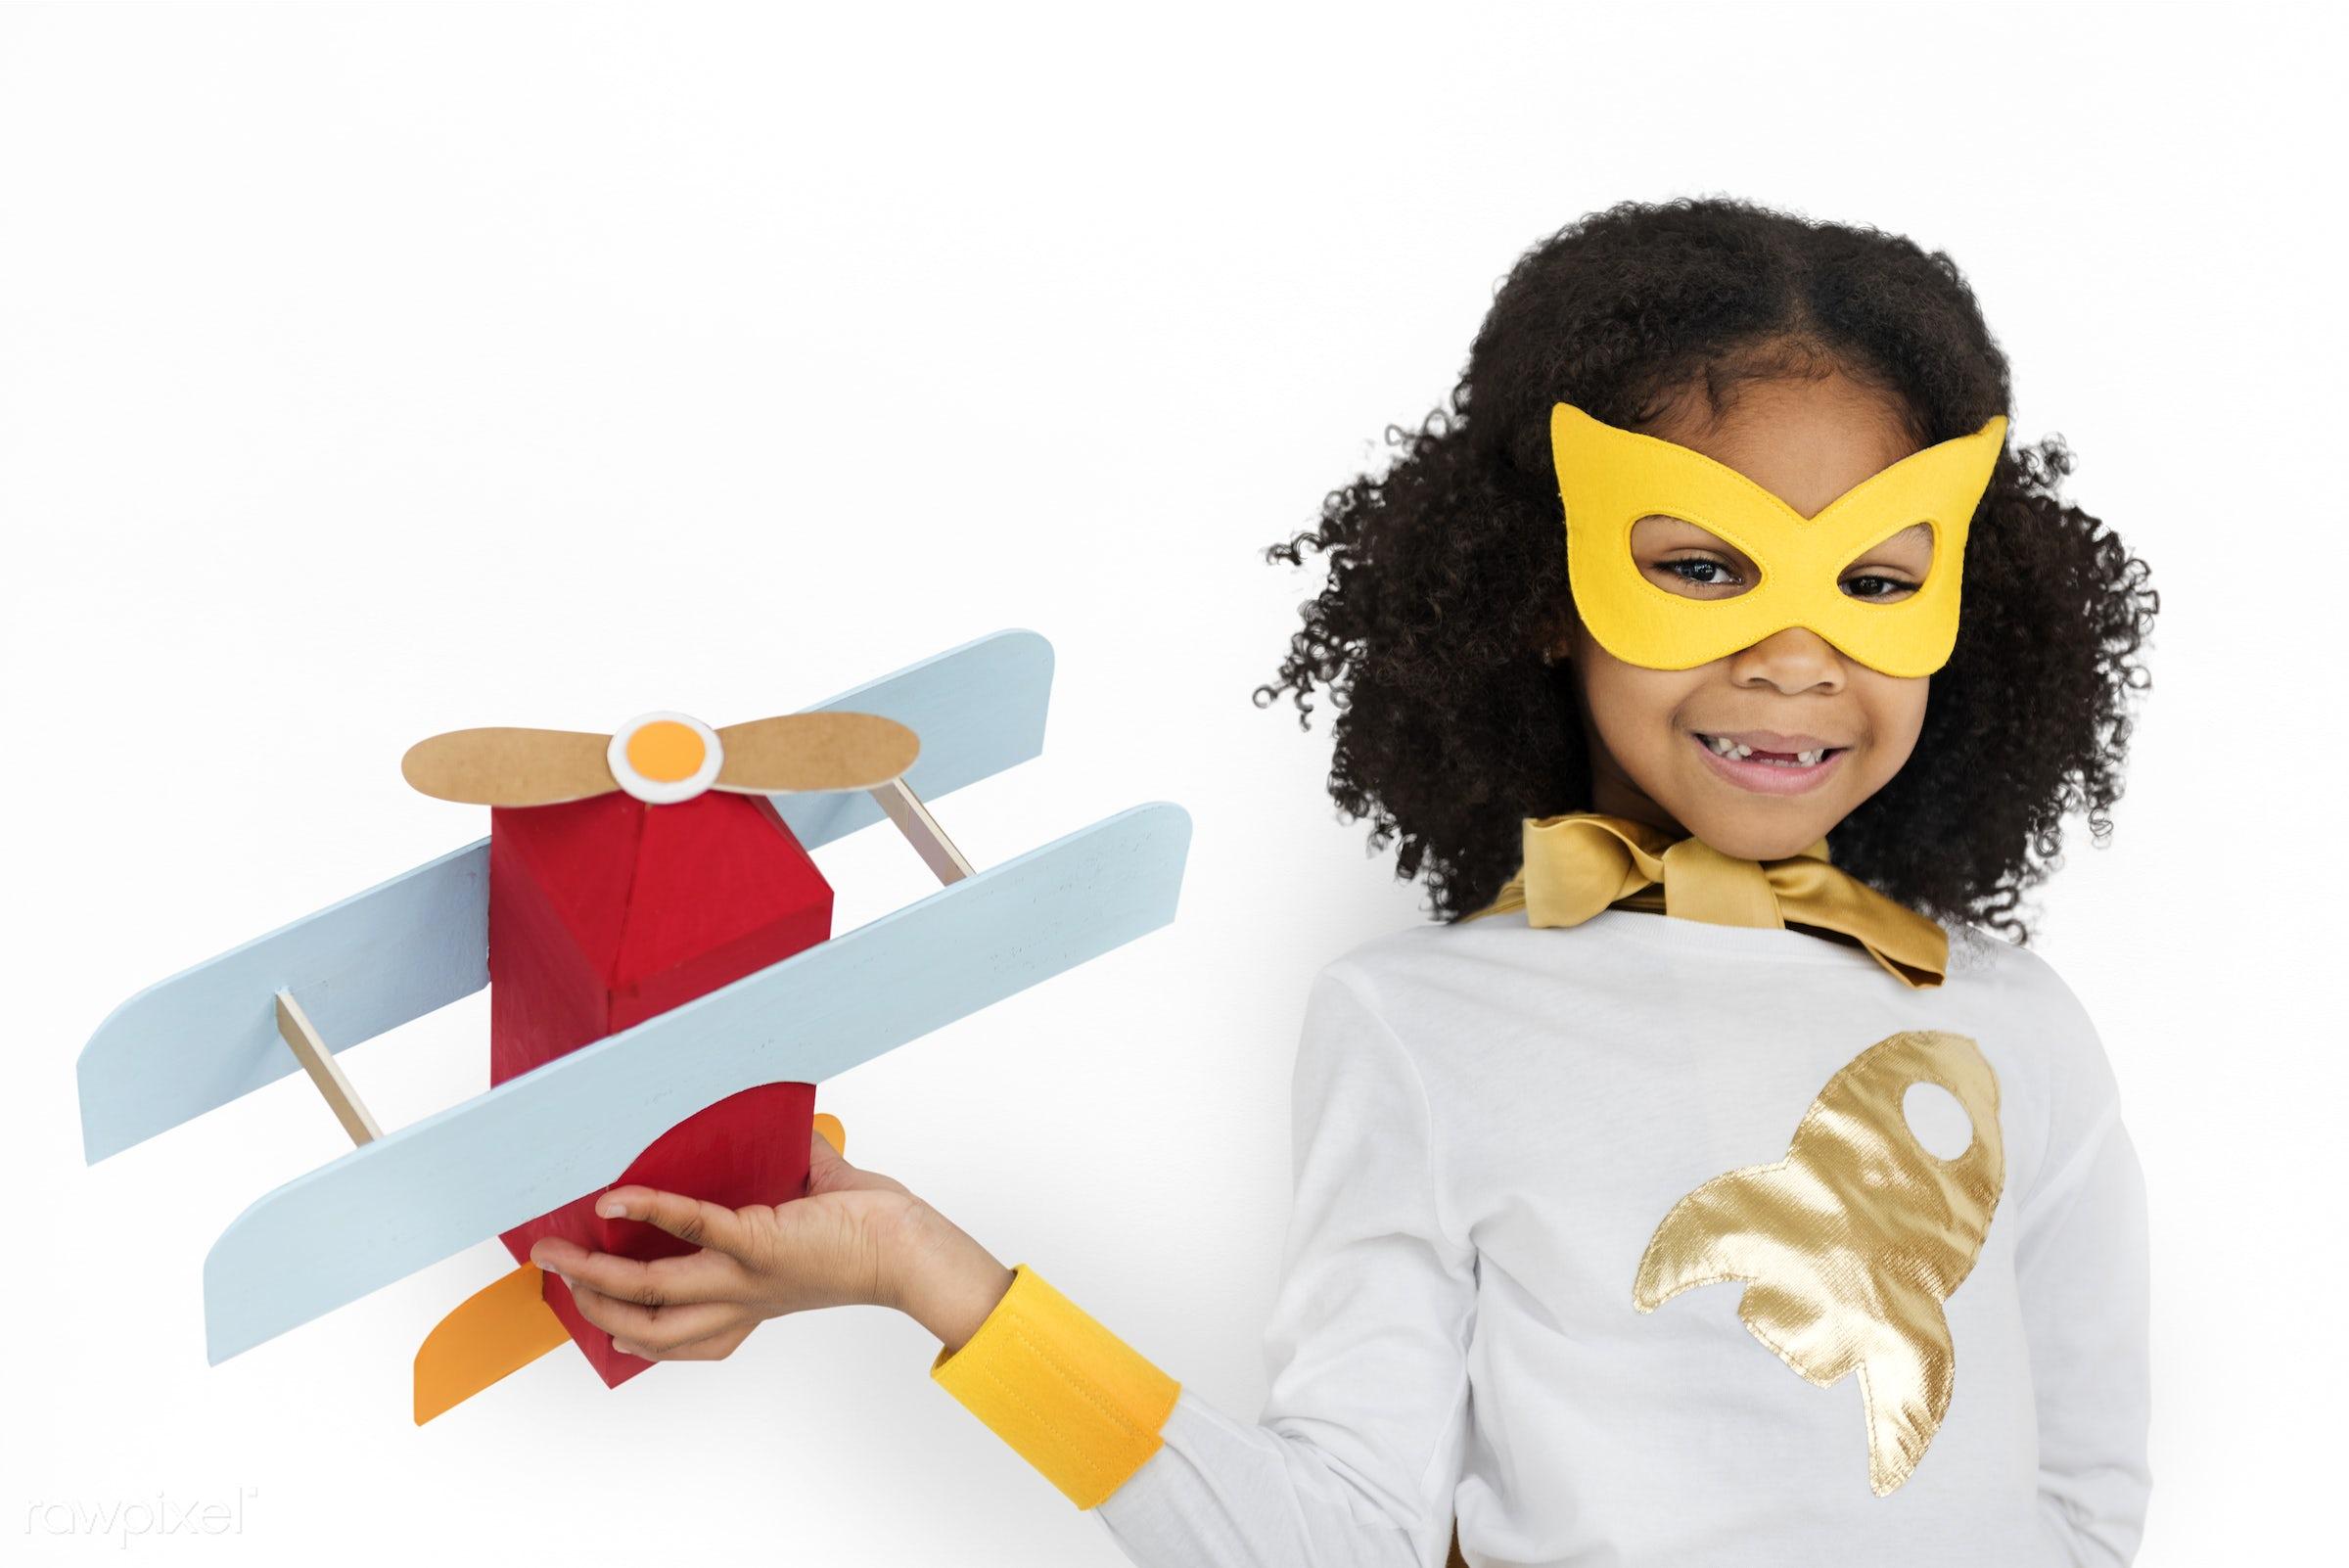 children, transportation, courageous, adolescence, kid, child, inspiration, girl, leader, idol, childhood, superhero,...